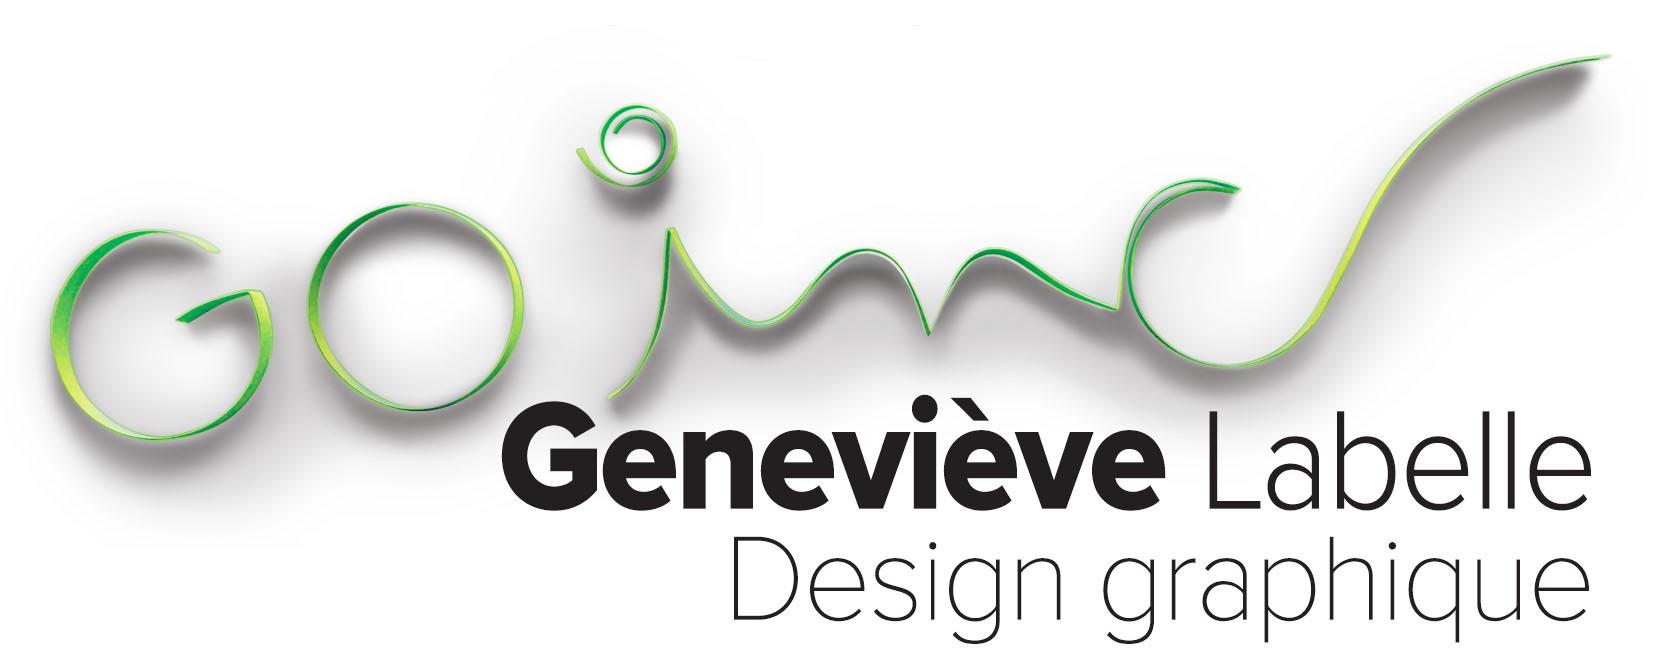 genevieve labelle